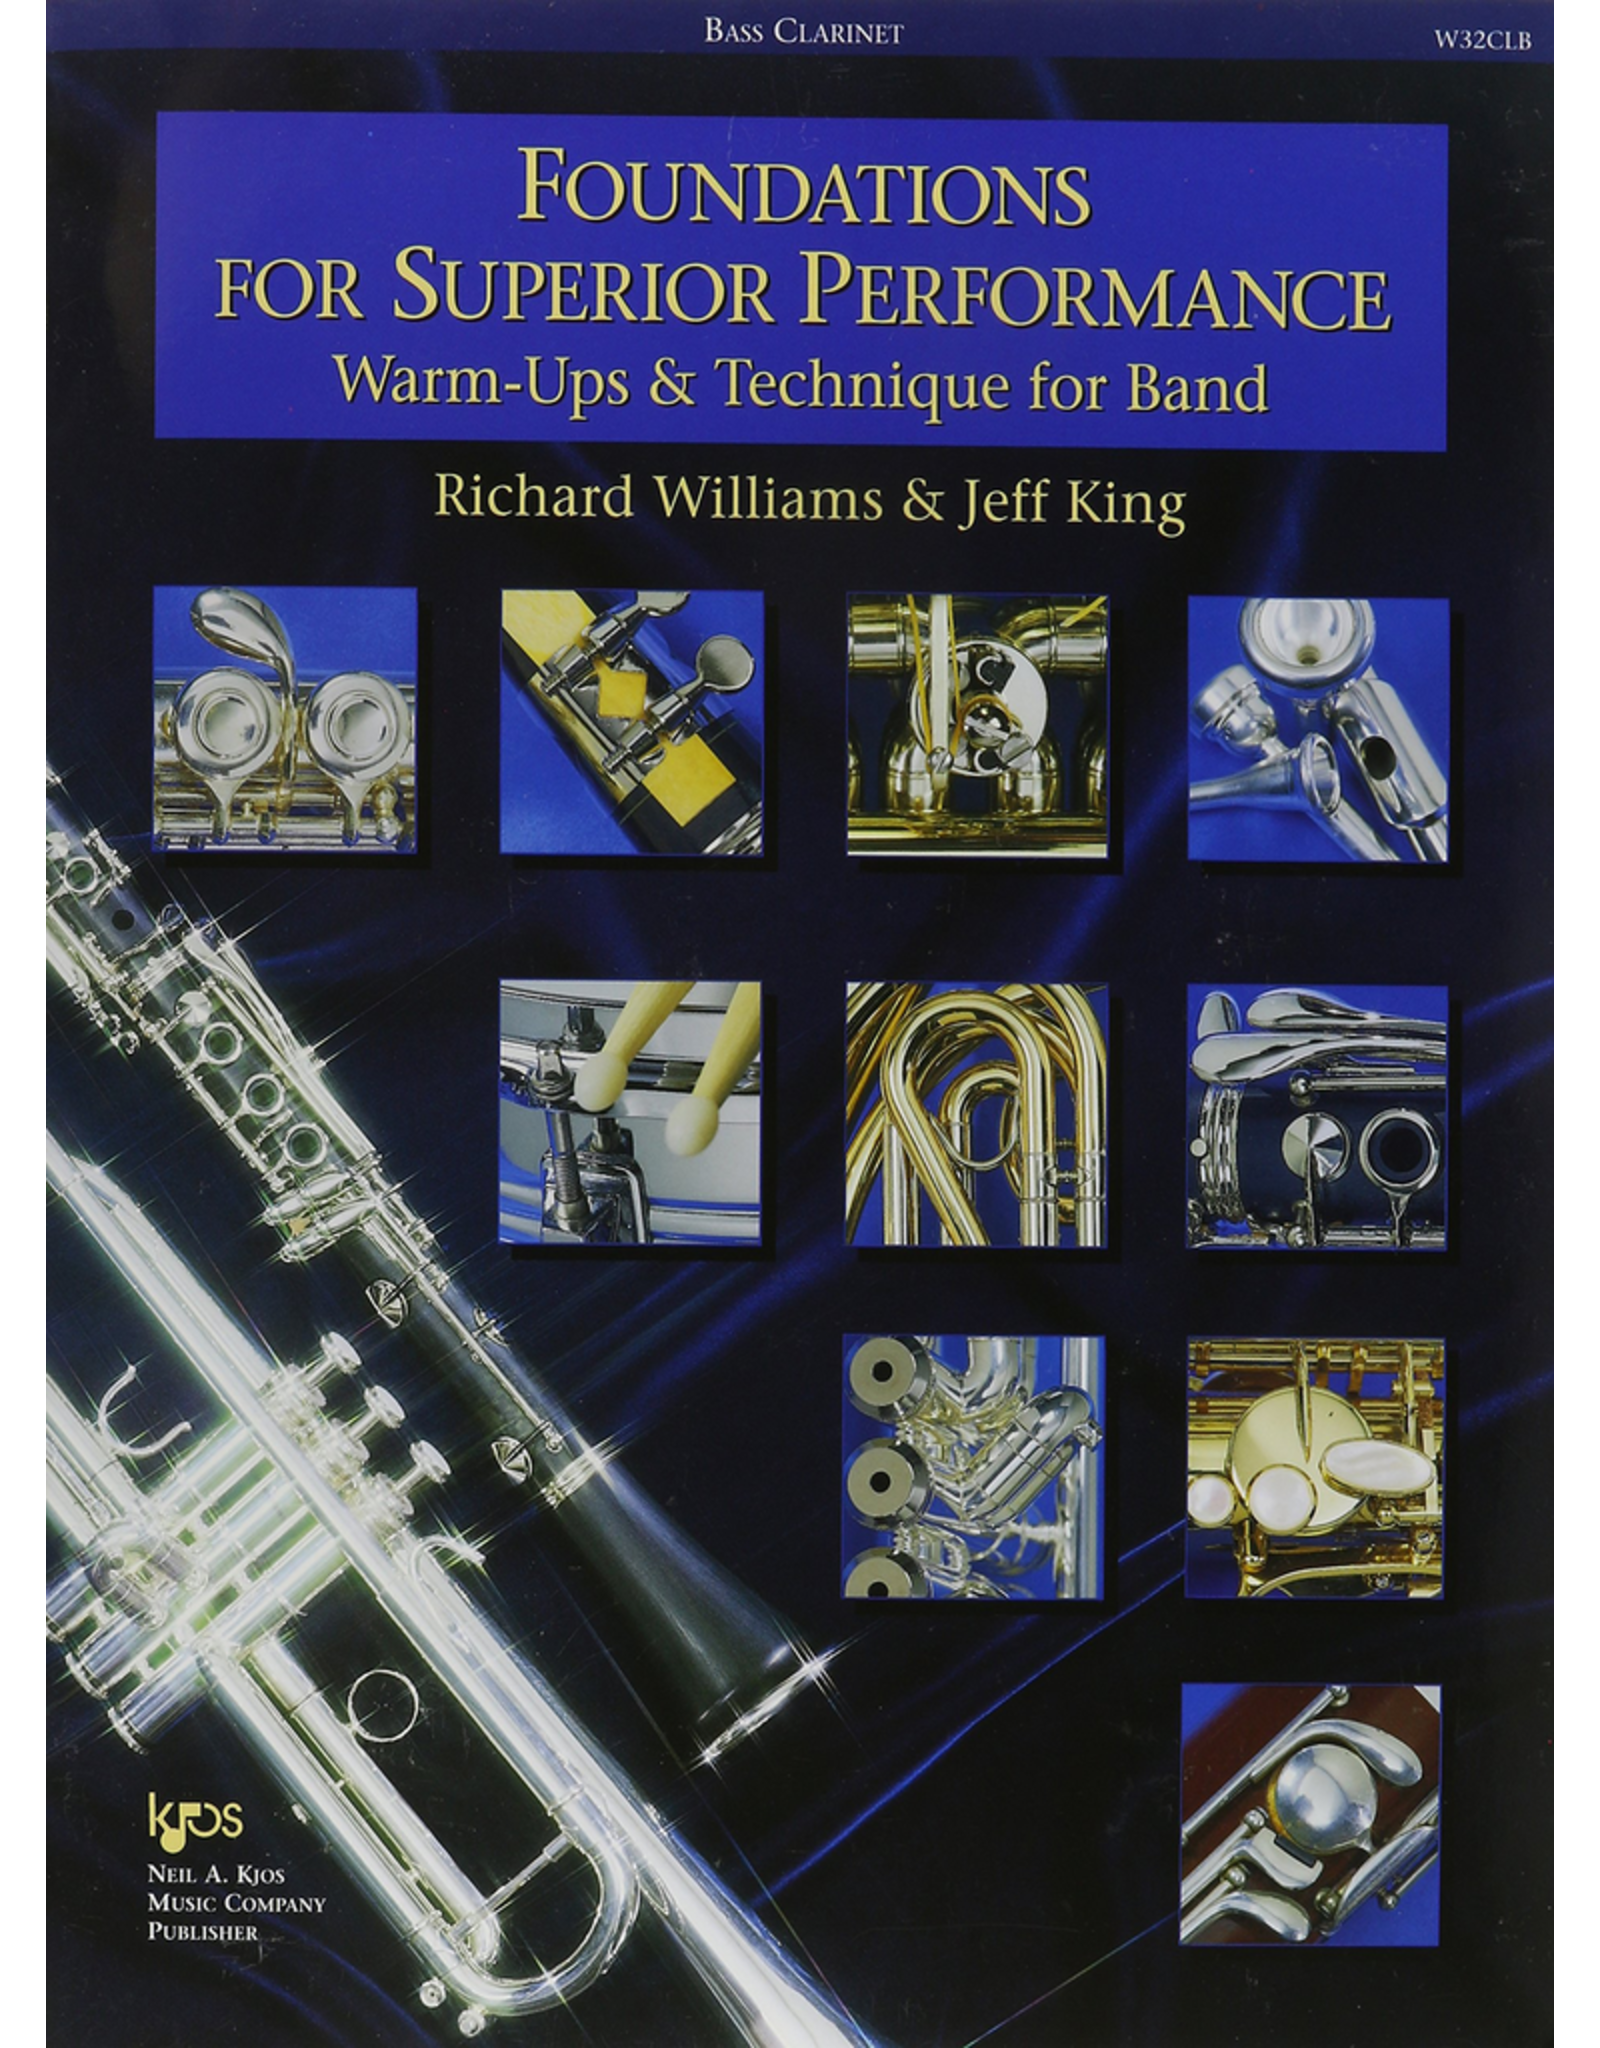 Kjos Foundations for Superior Performance, Bass Clarinet